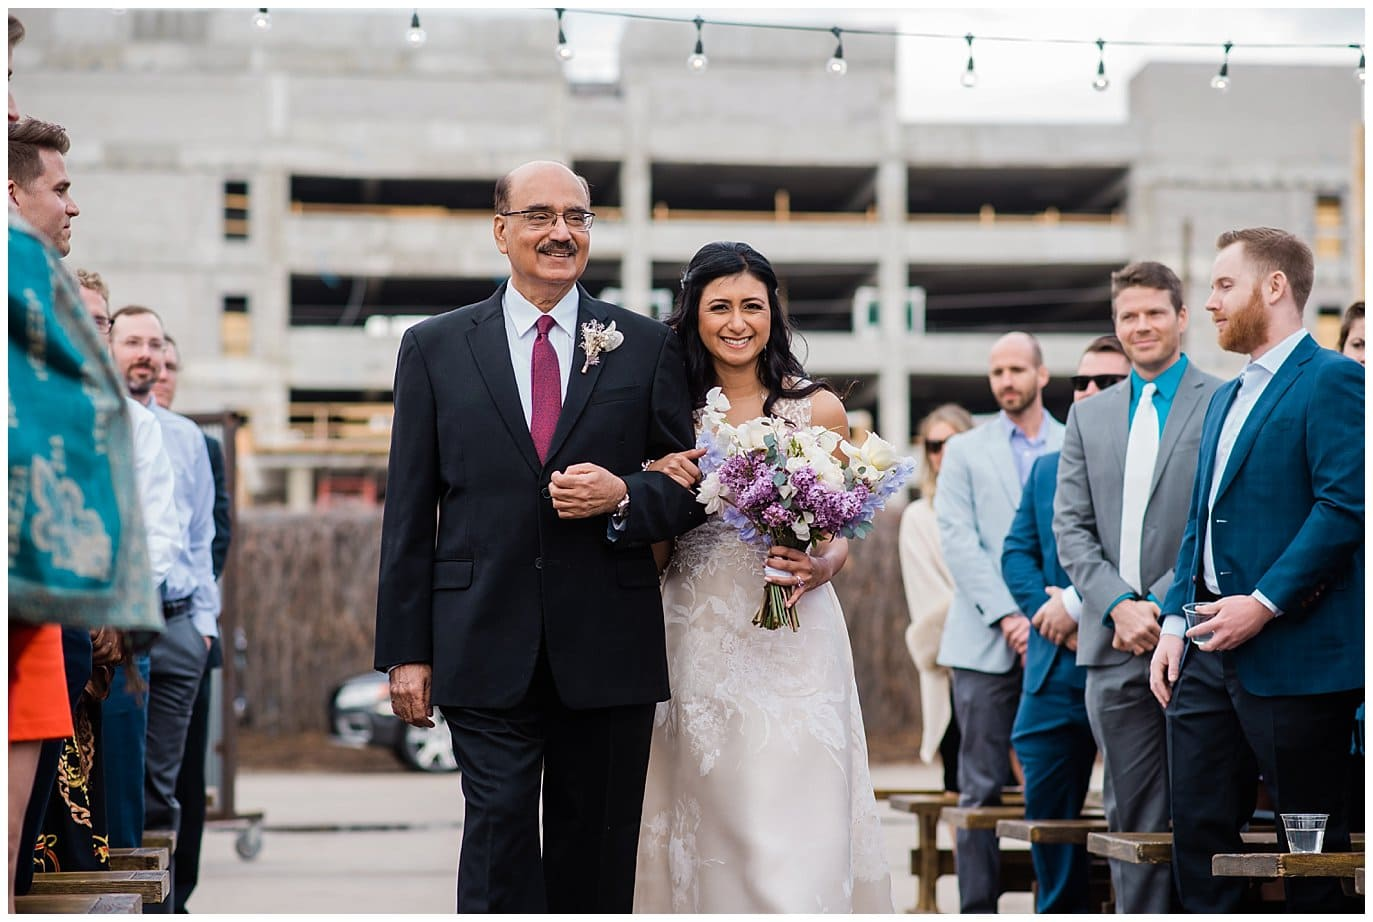 bride's dad walks bride down aisle at Blanc Wedding by Denver Wedding Photographer Jennie Crate